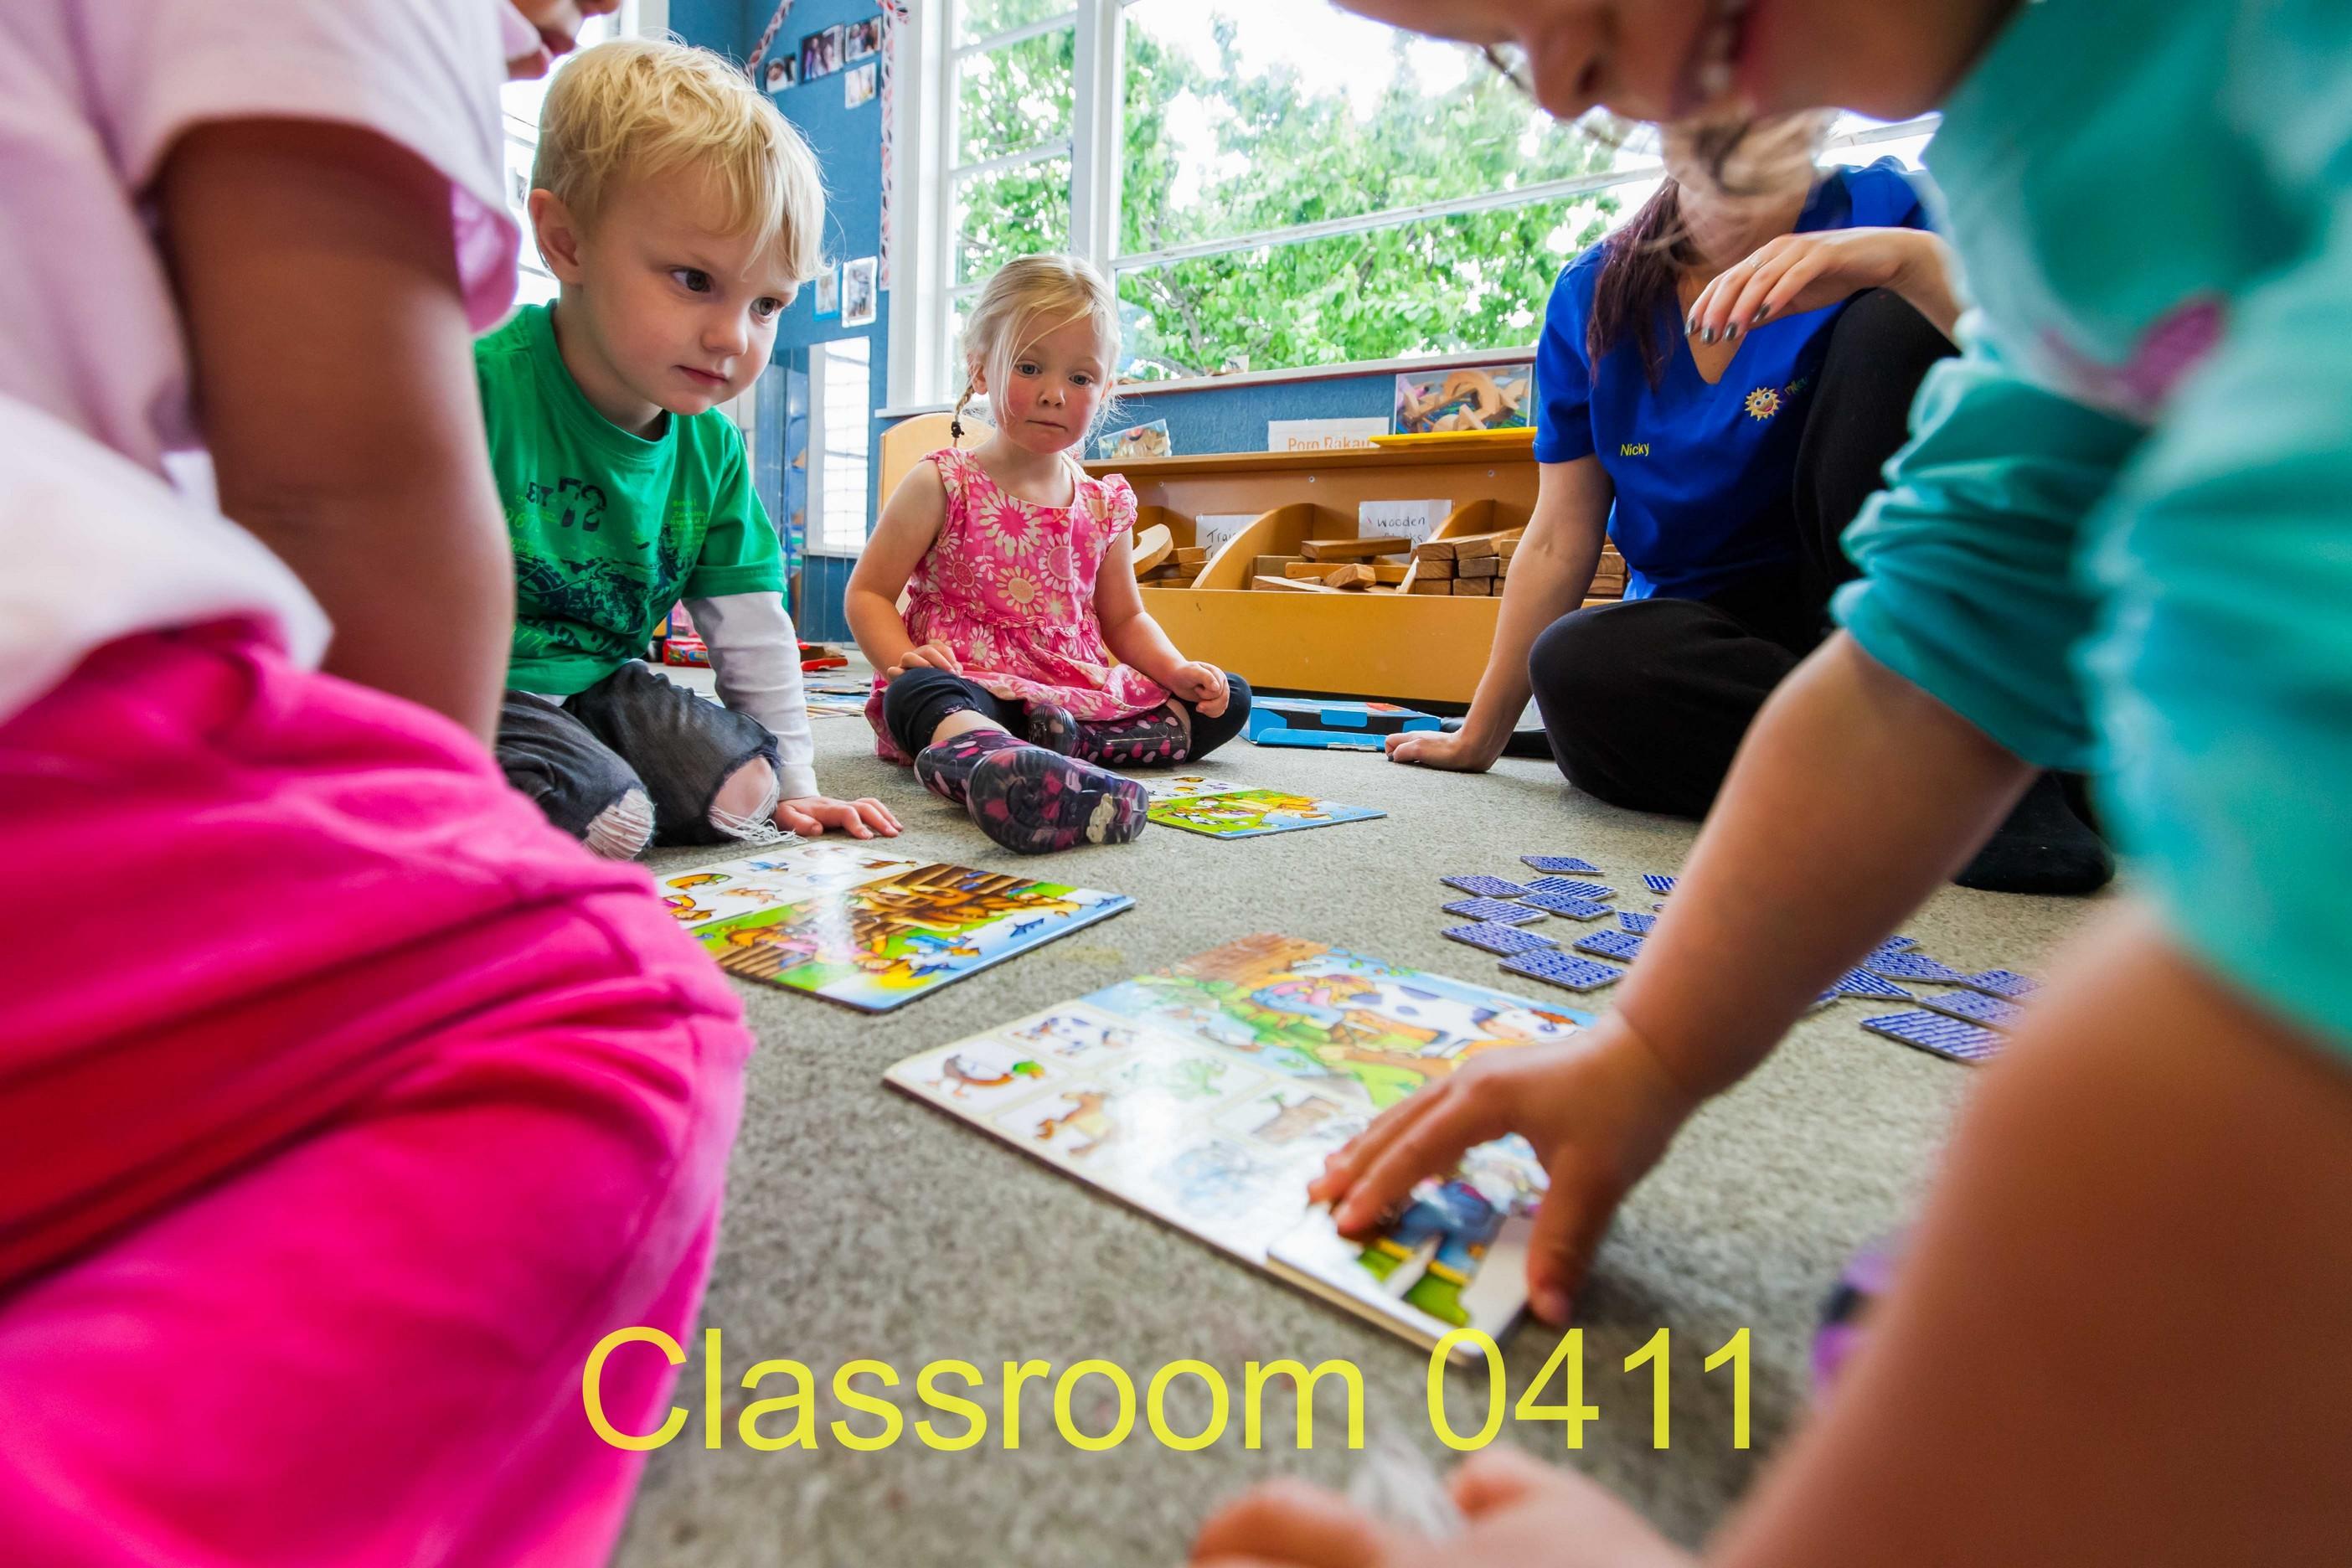 Classroom 0411